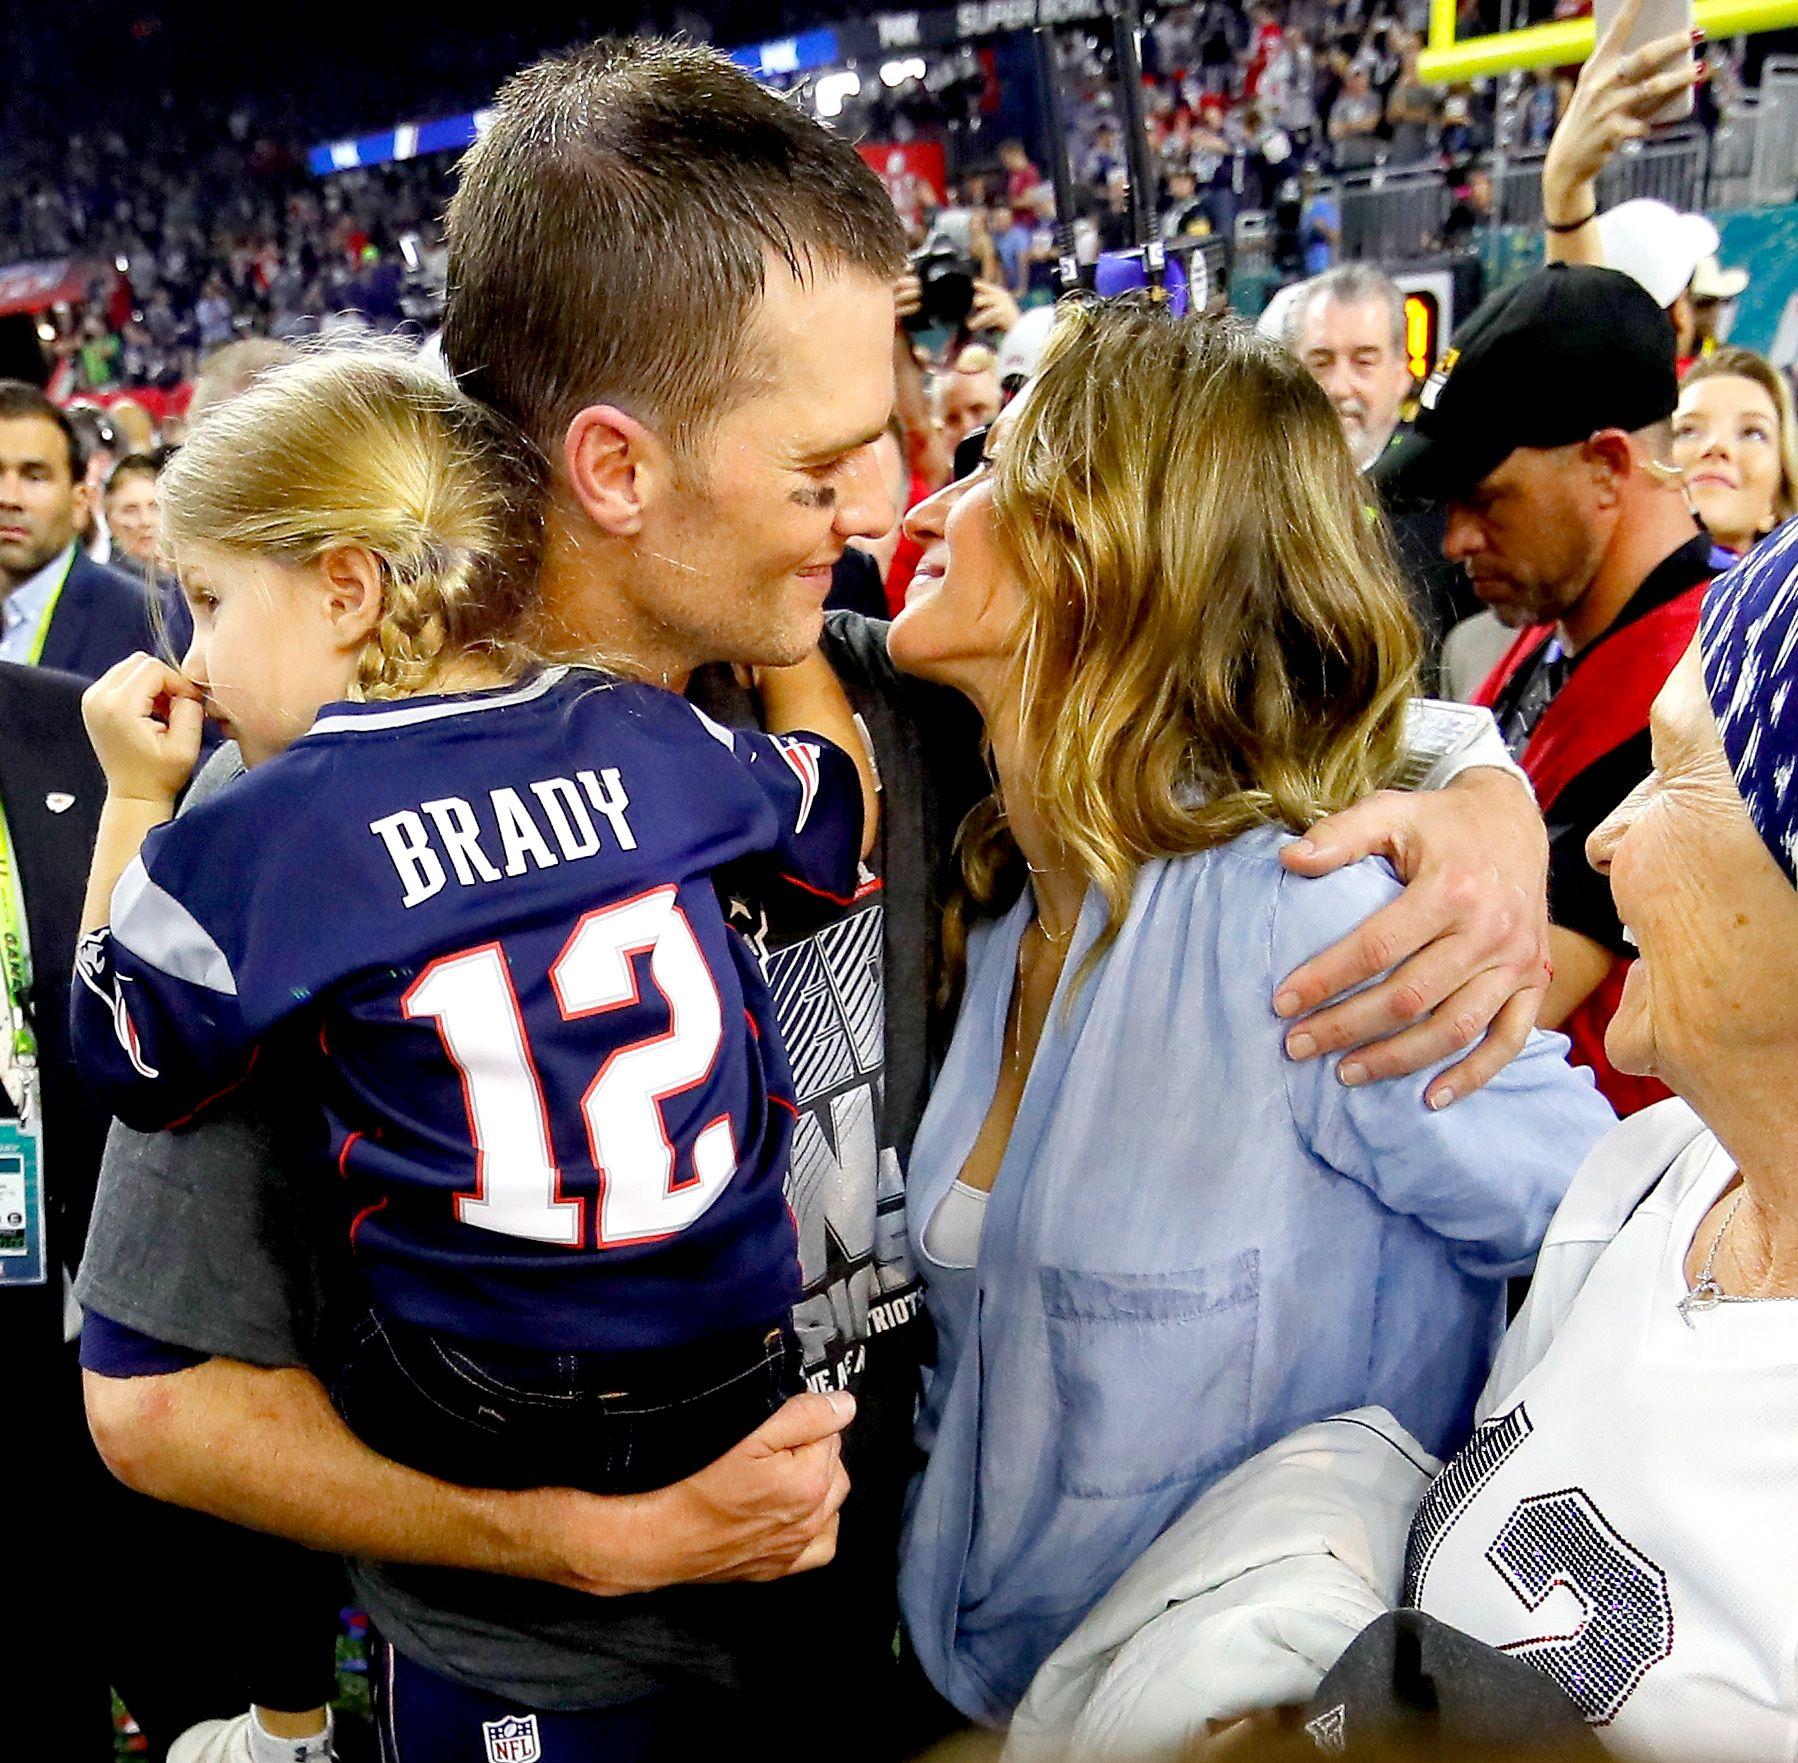 Image Result For Patricia Nonnenmacher Bundchen Tom Brady And Gisele Tom Brady New England Patriots